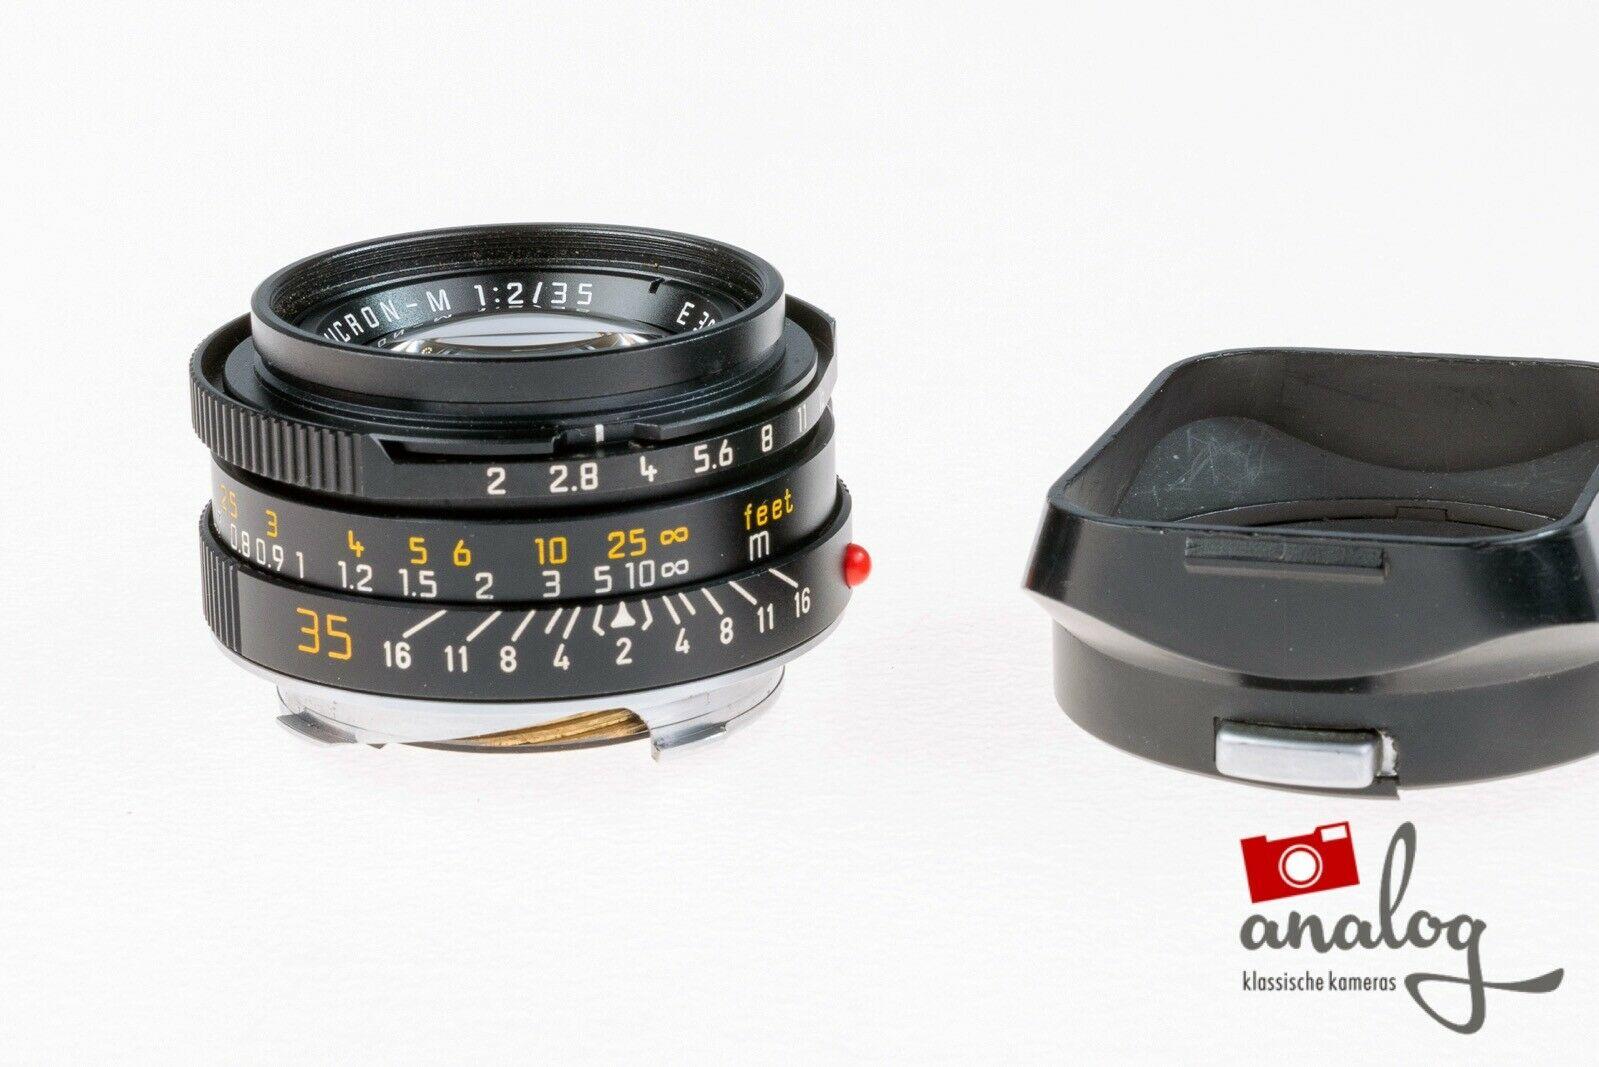 Leica Summicron-M 35mm 2.0 - 11310 - King of Bokeh - werkstattüberholt